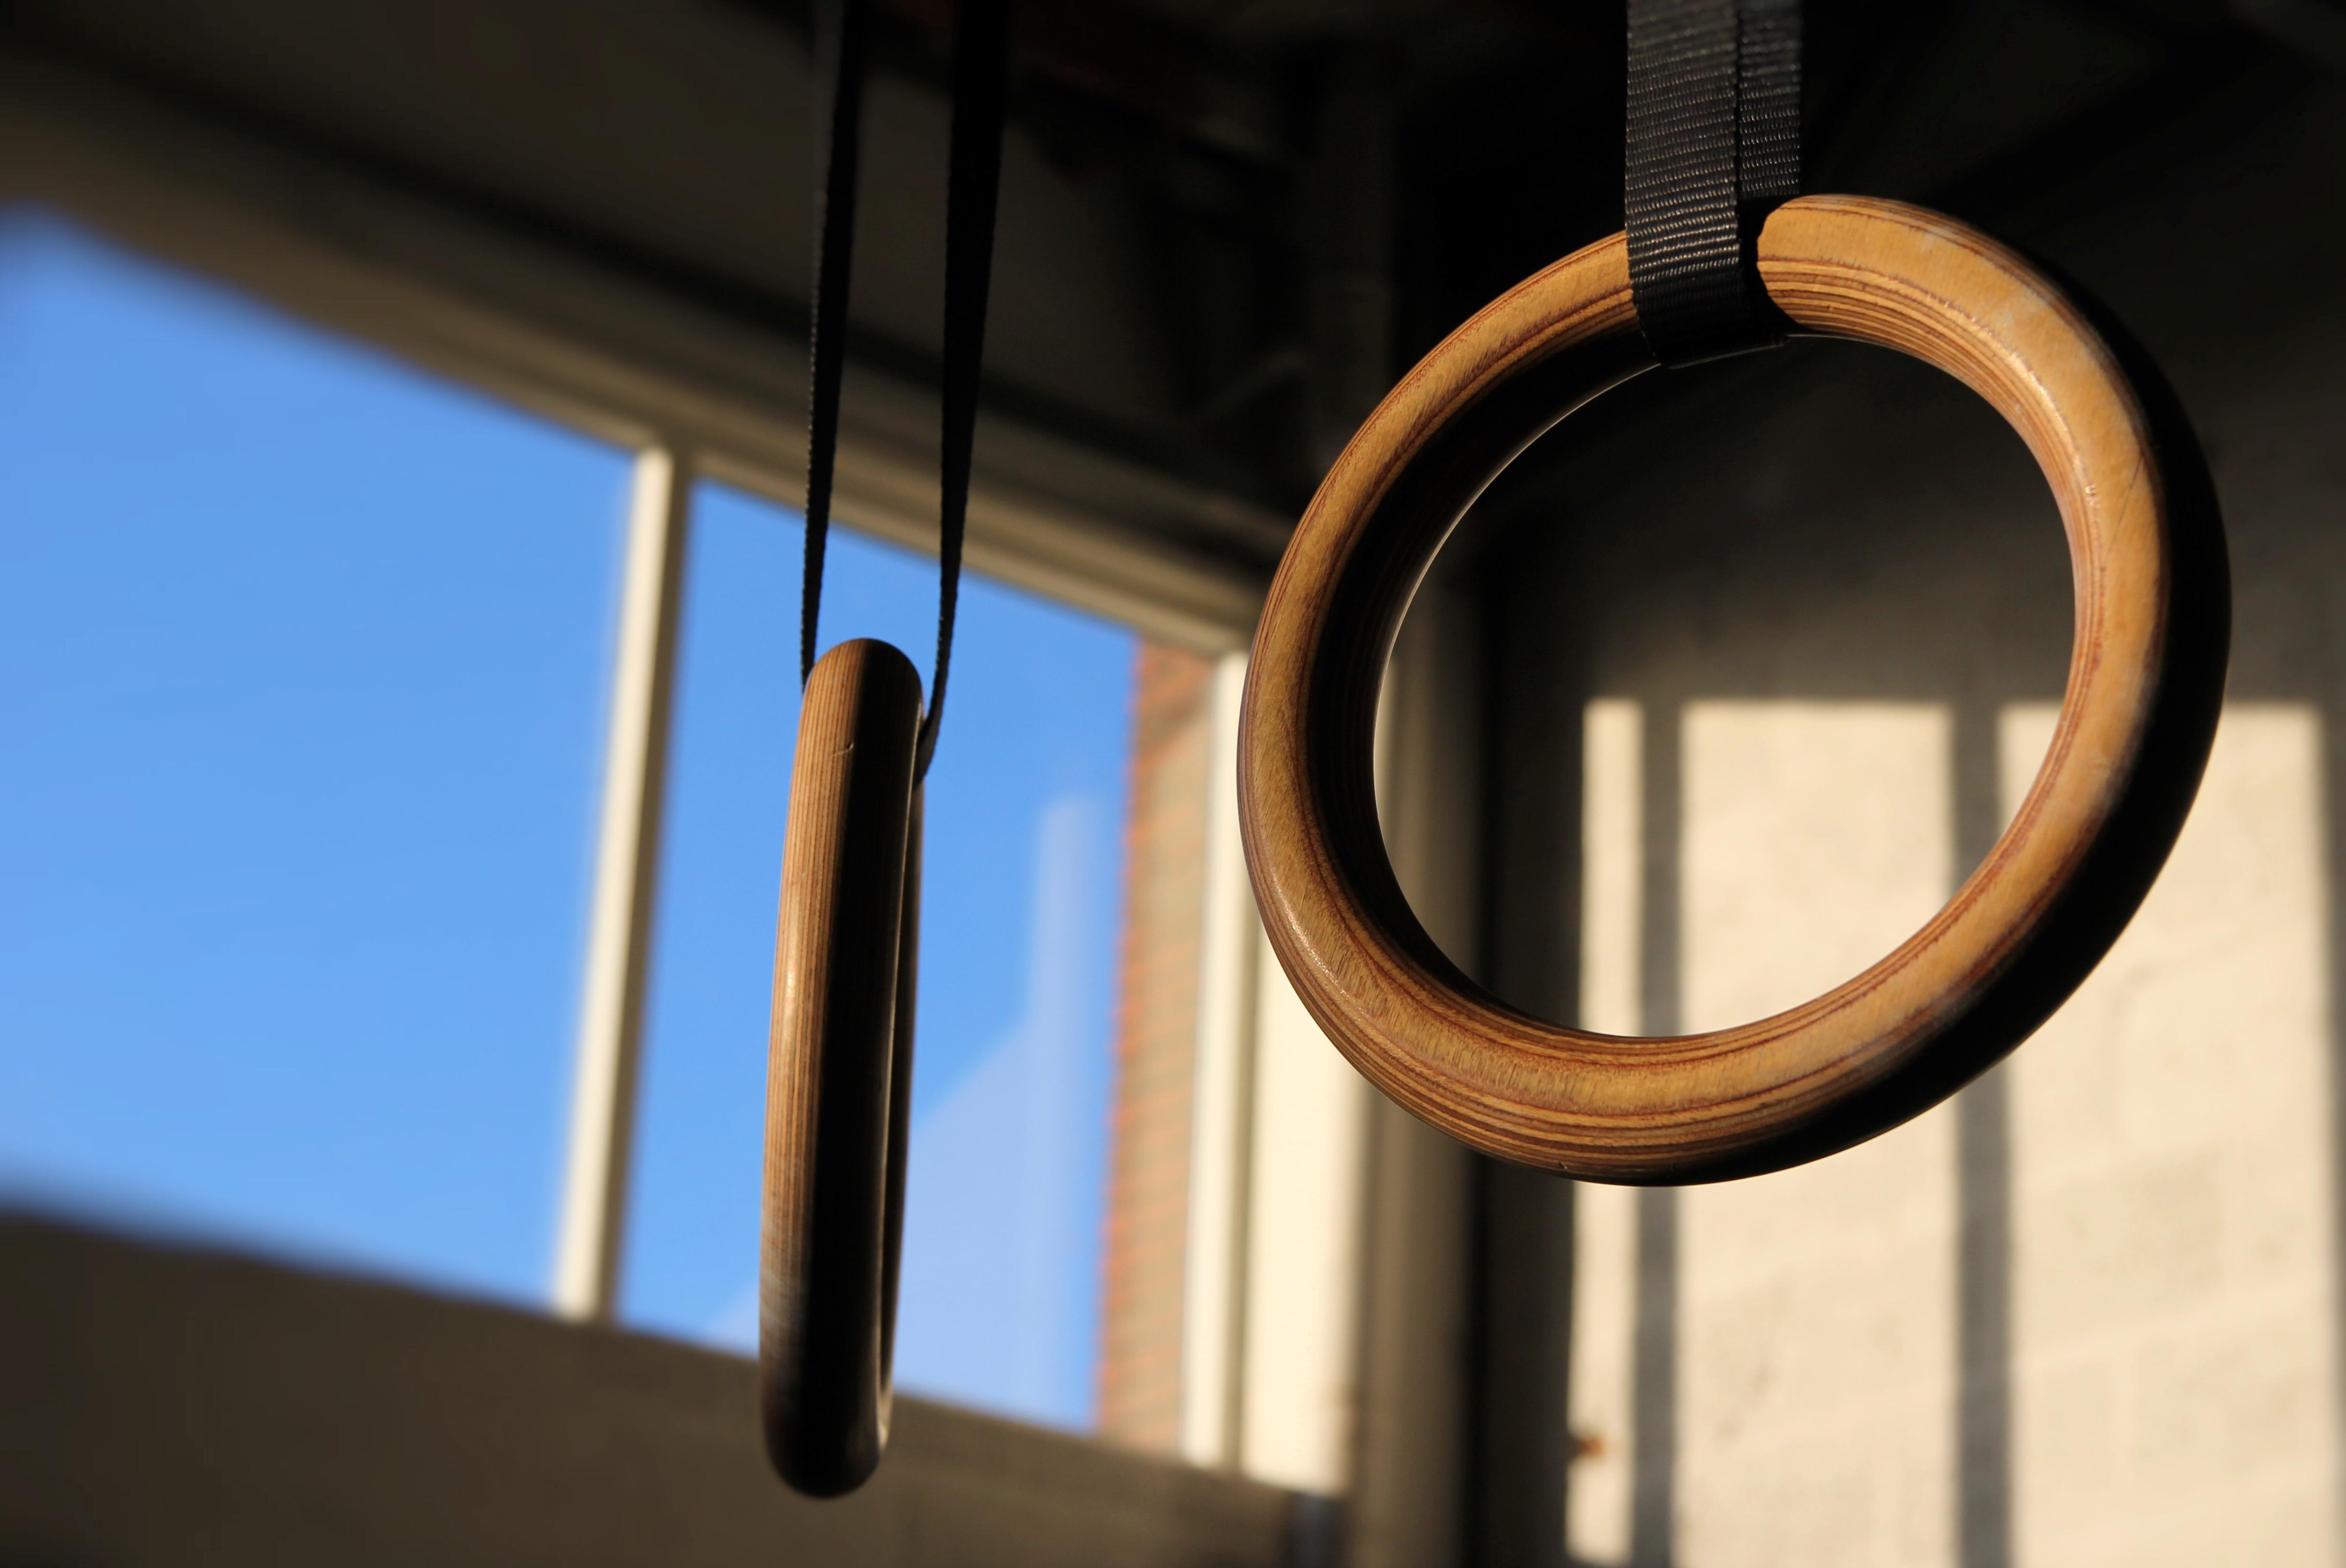 Rings In Sun